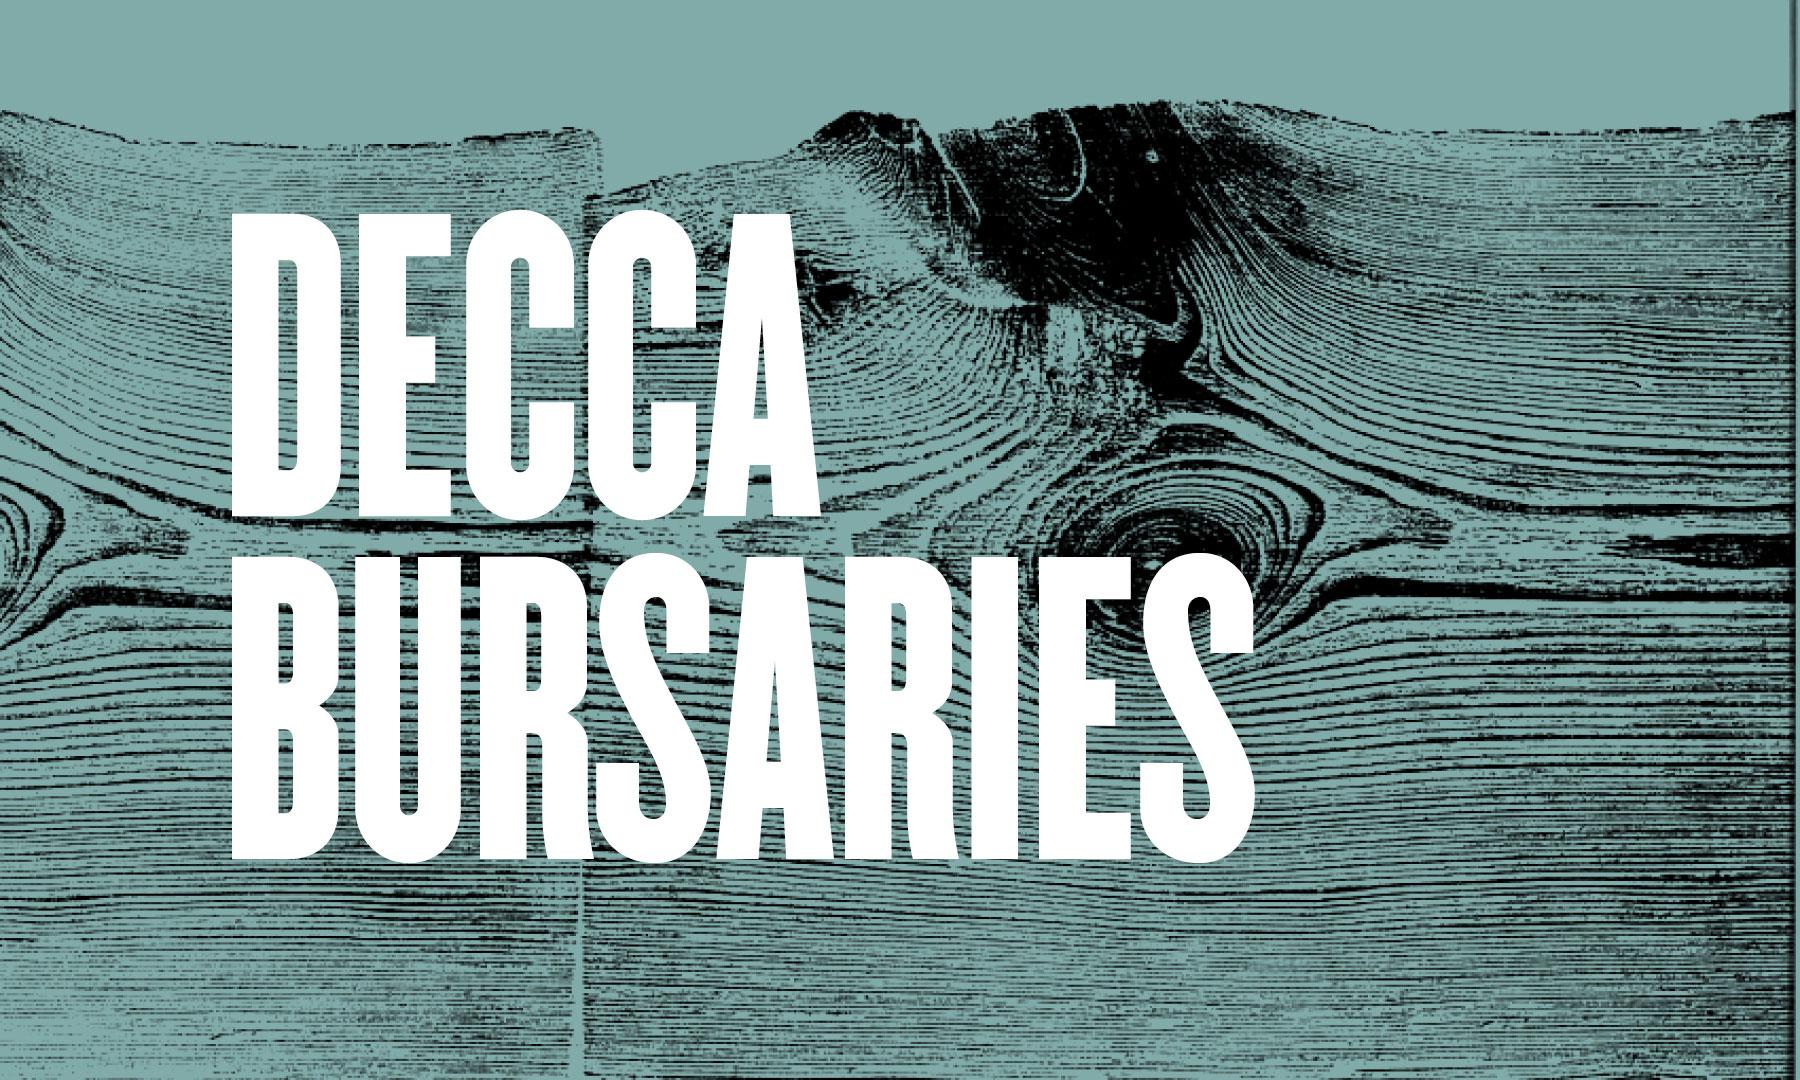 Decca_Bursaries7